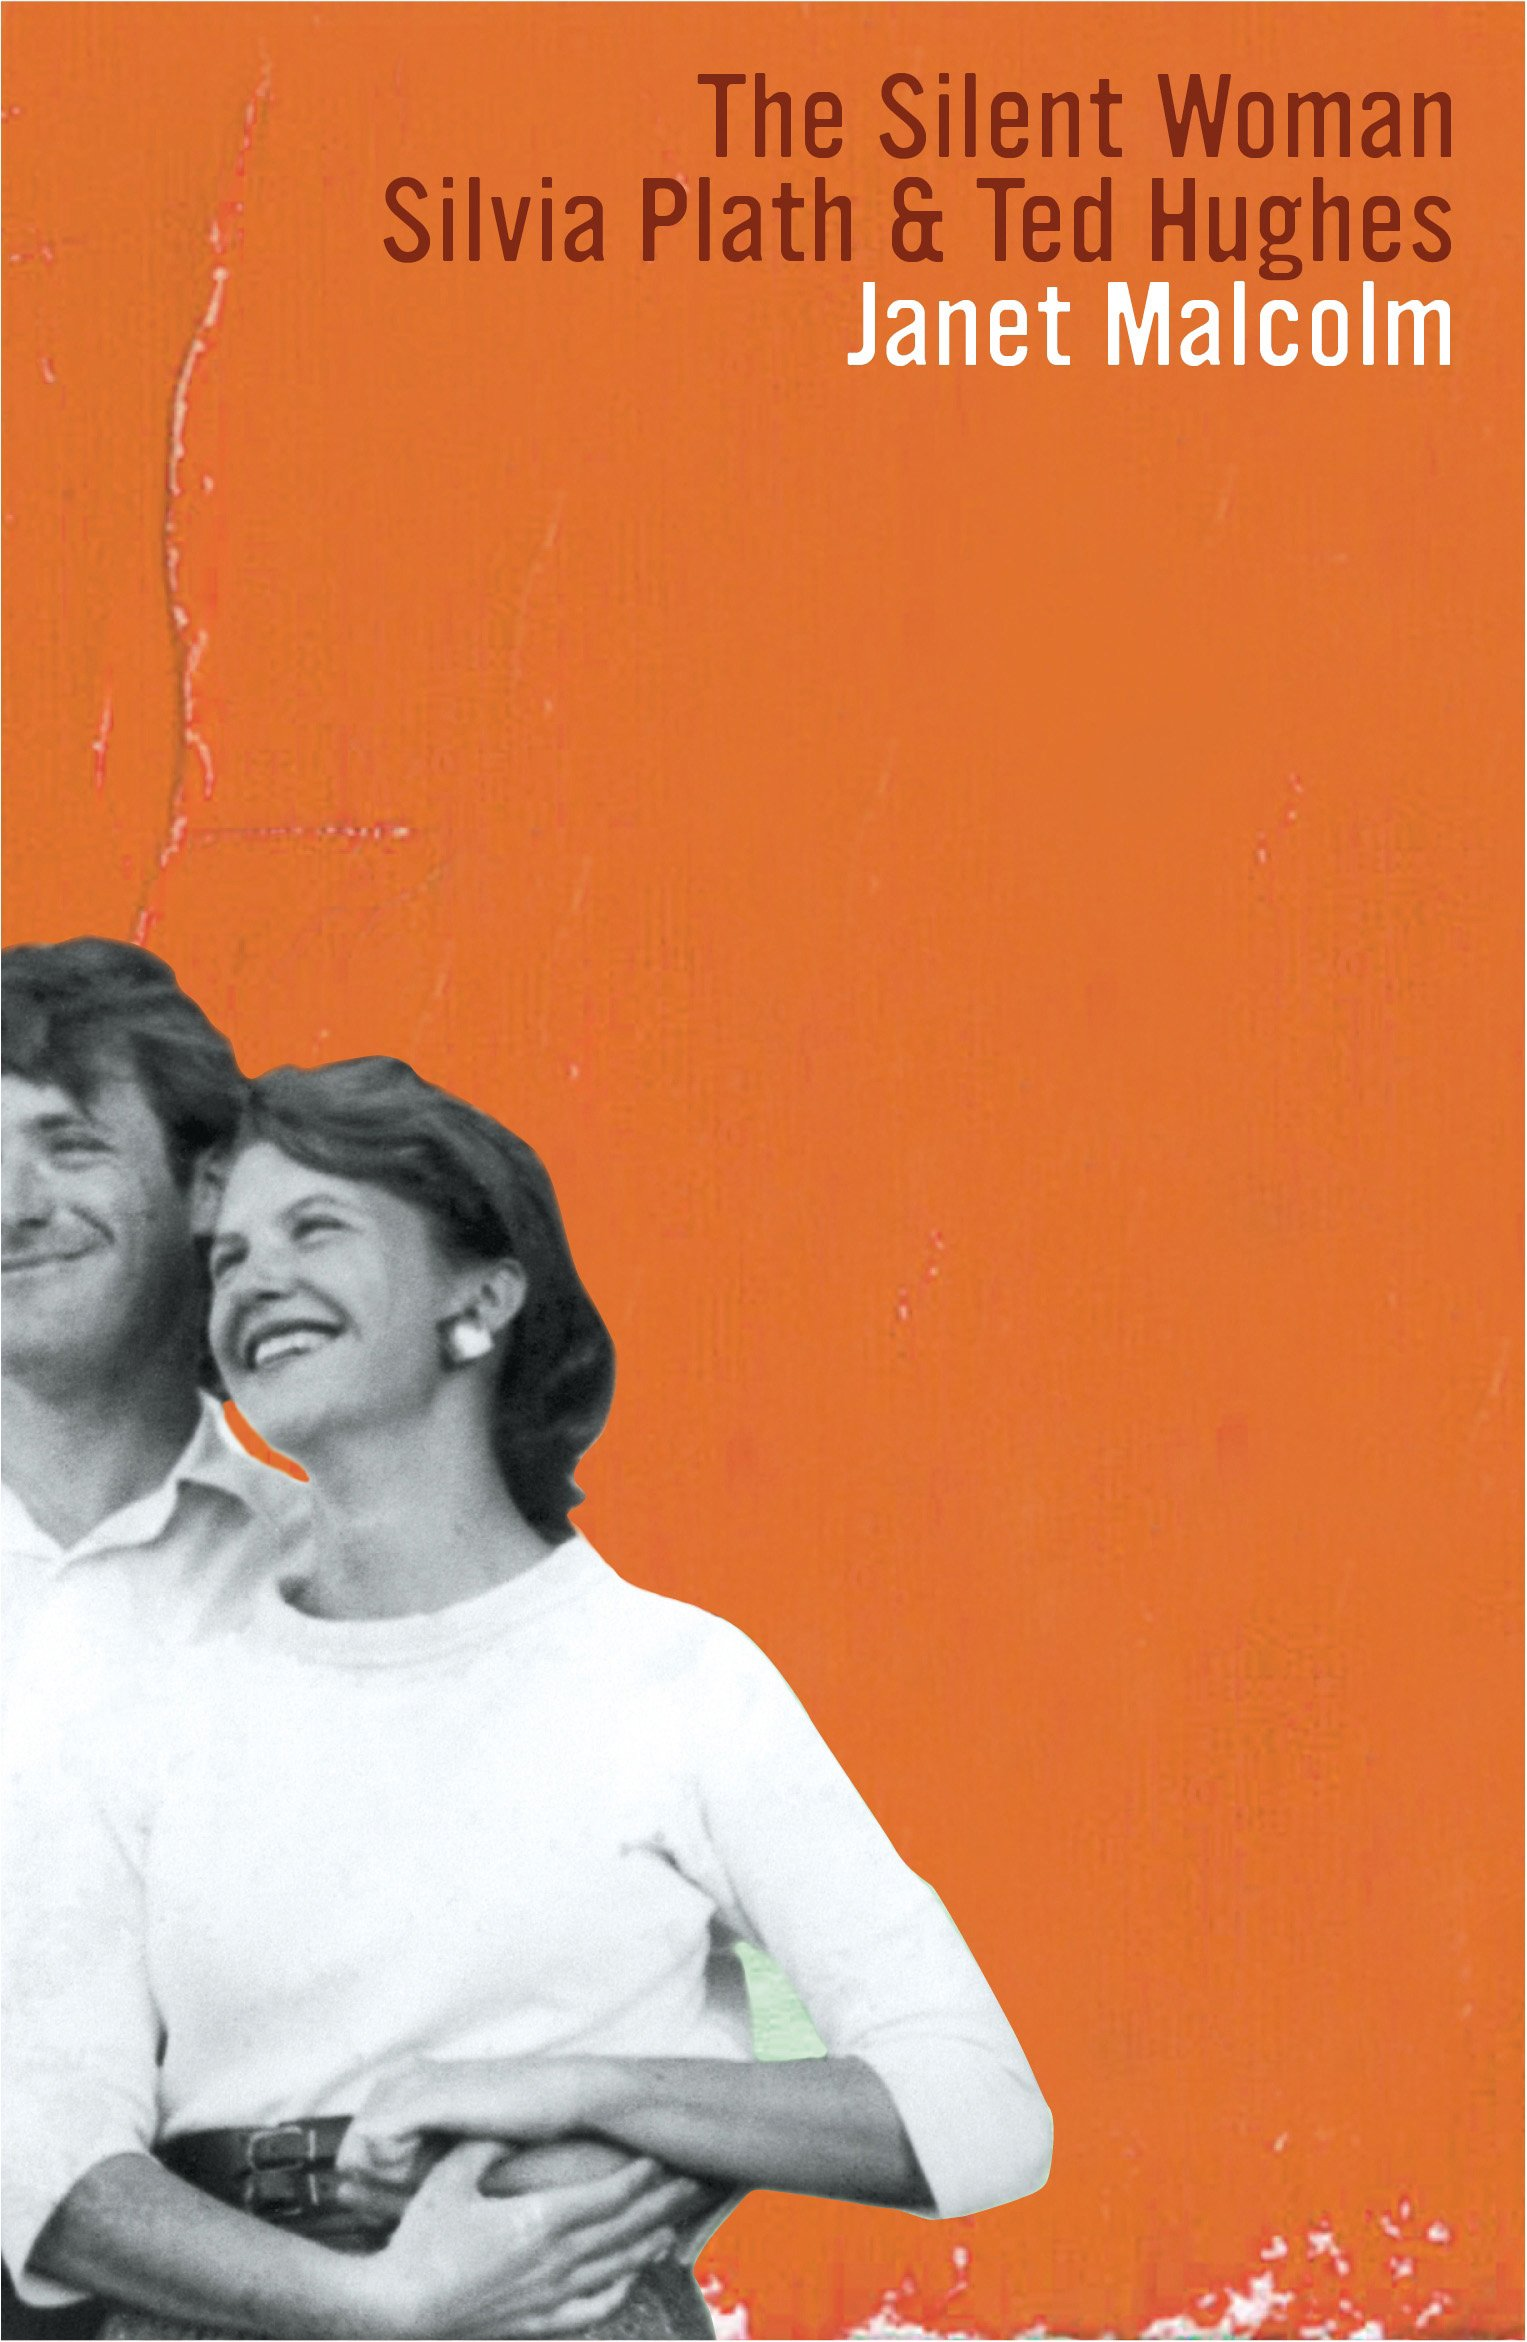 The Silent Woman: Sylvia Plath And Ted Hughes (Granta Editions)